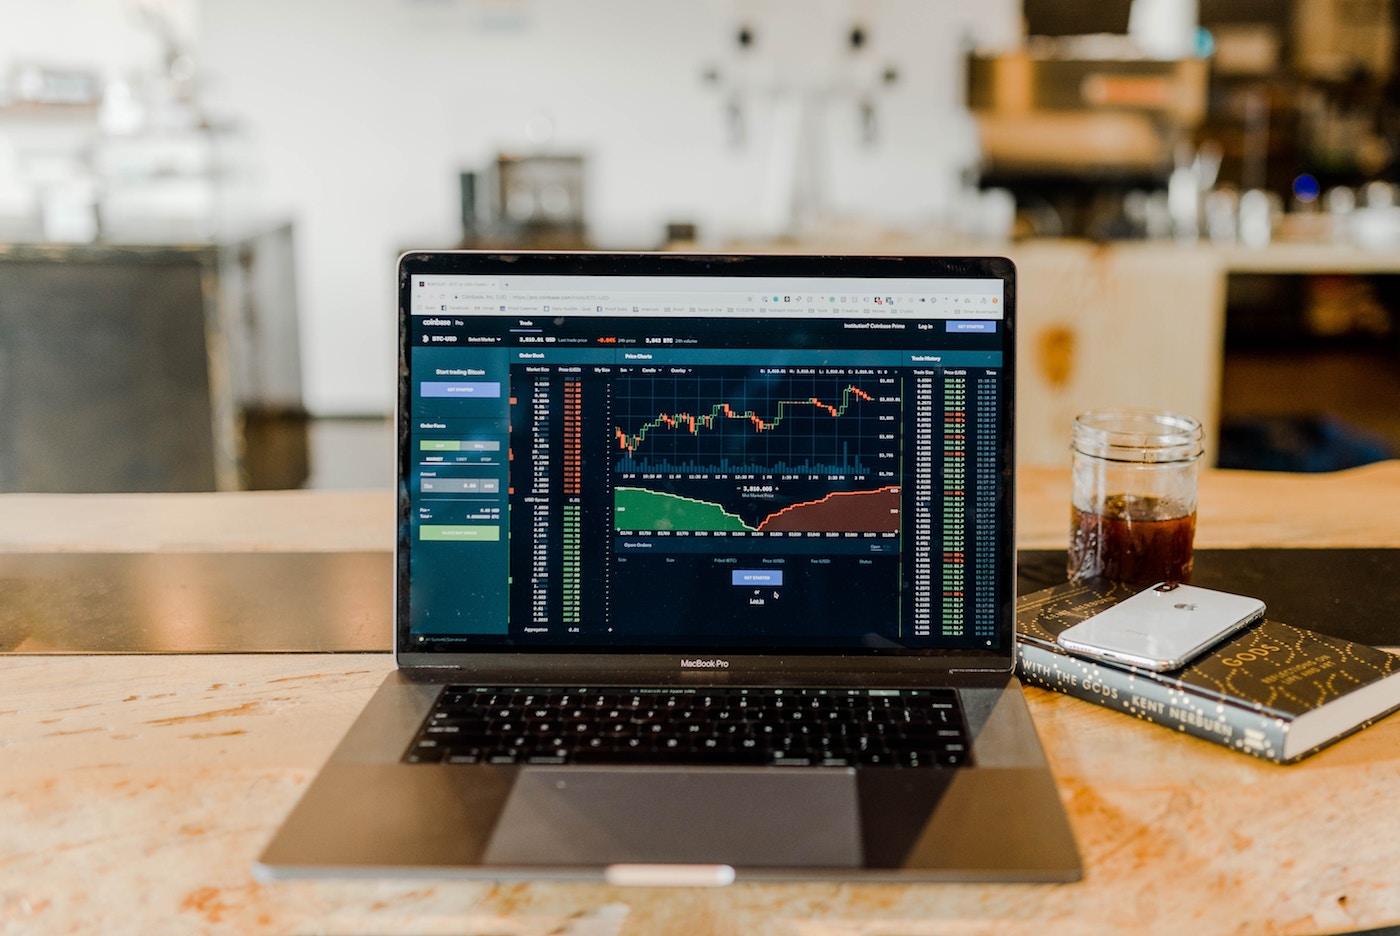 fiat deposits withdrawals exchange